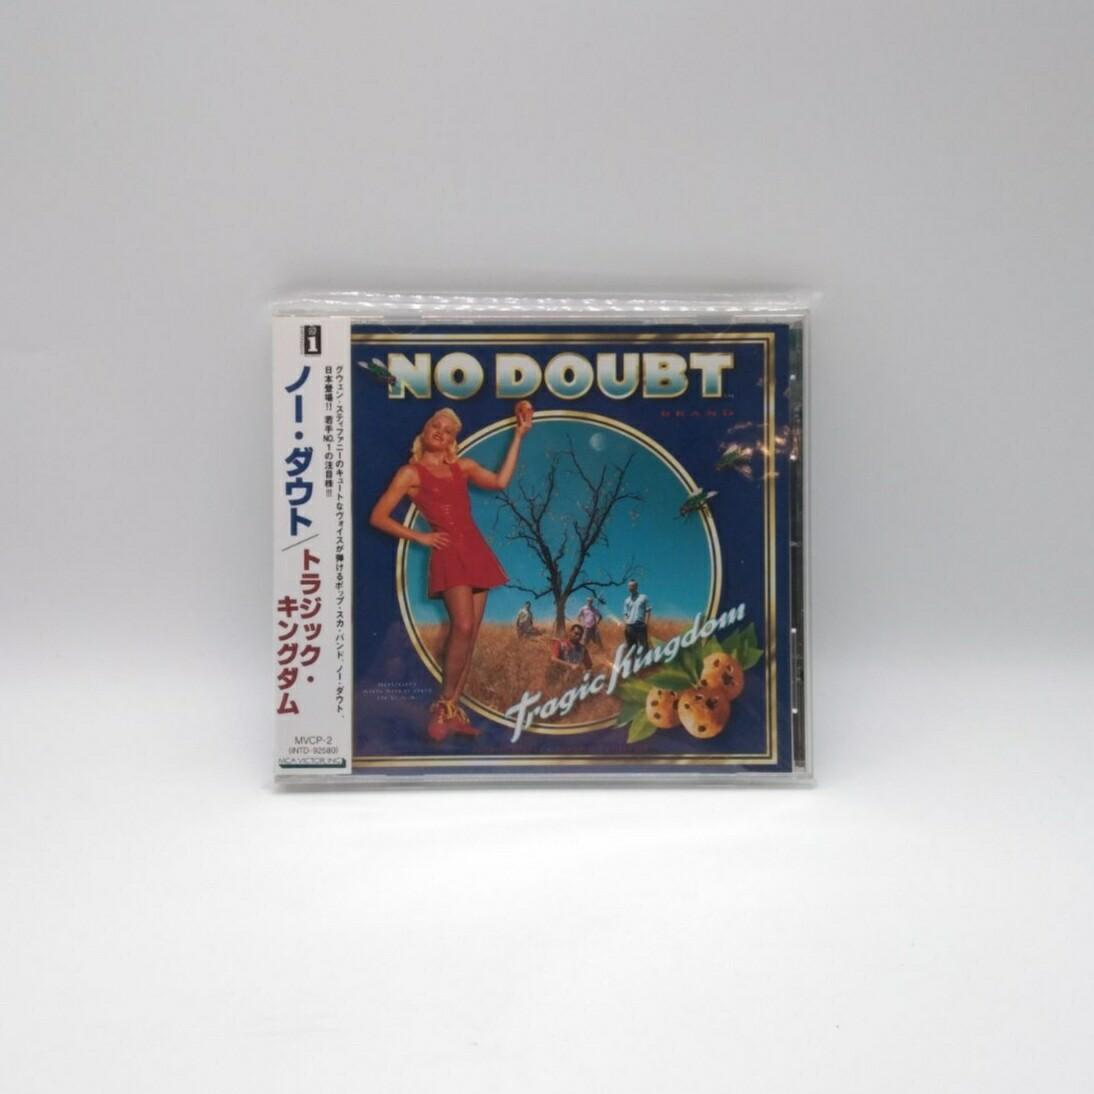 [USED] NO DOUBT -TRAGIC KINGDOM- CD (JAPAN PRESS)